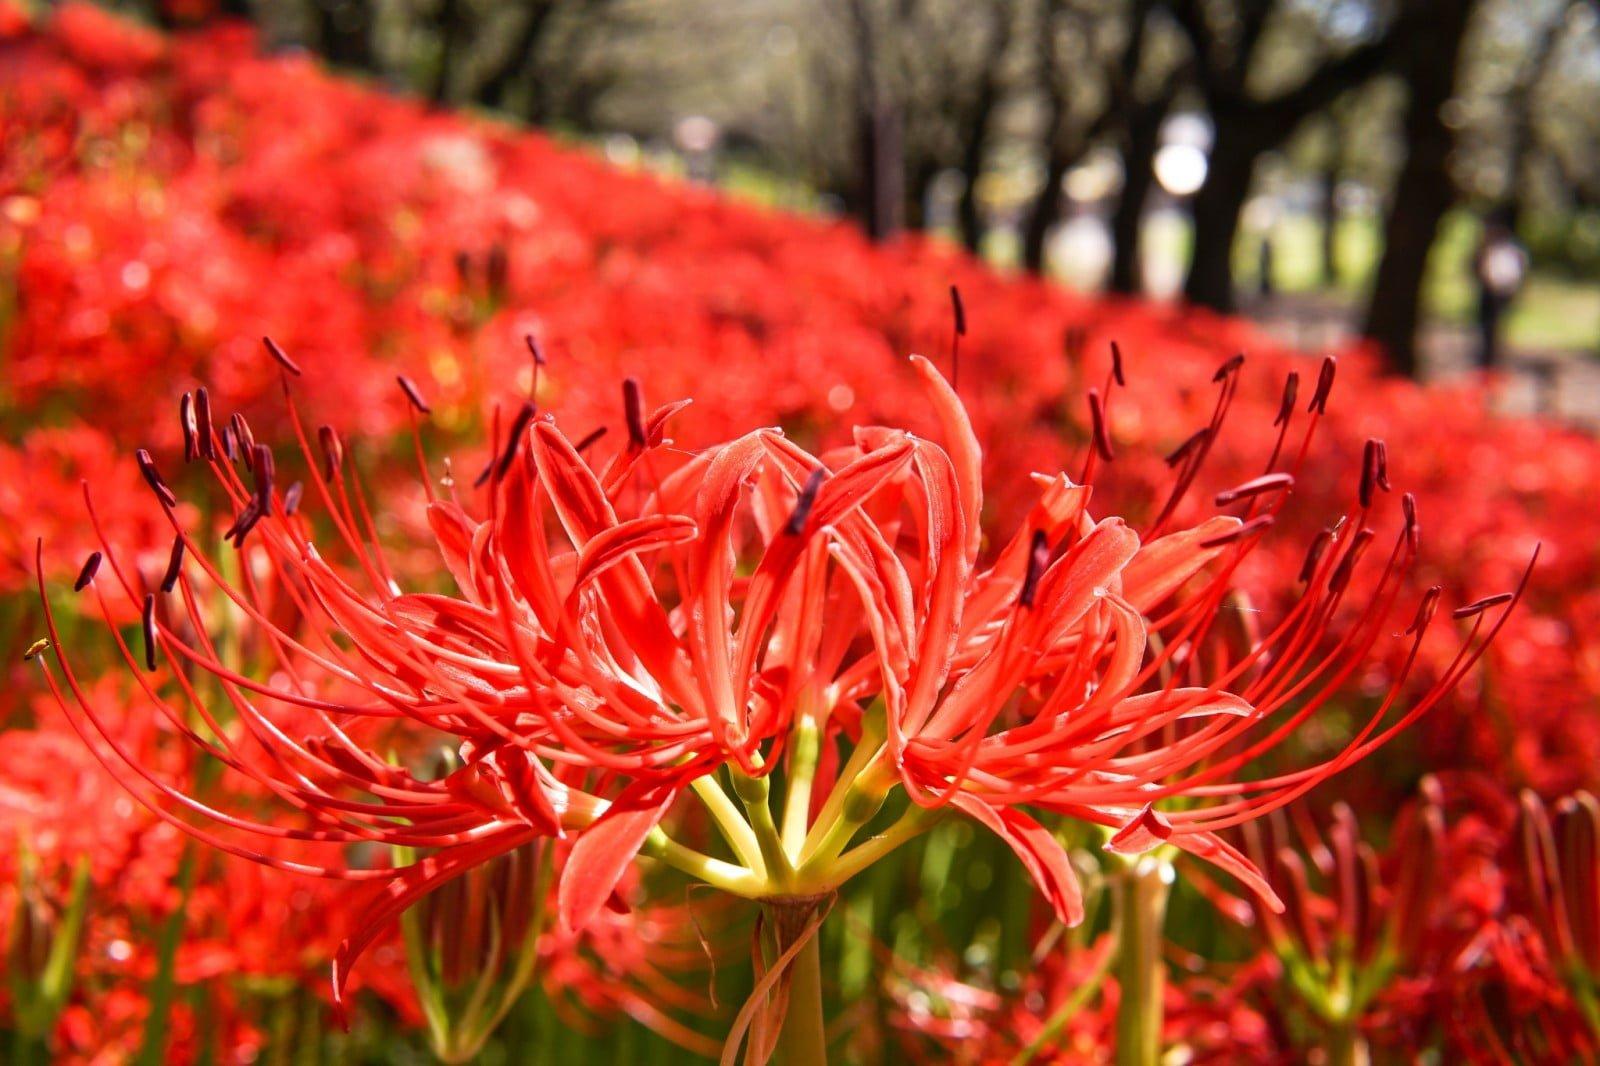 Vi vu Nhật Bản ngắm hoa Bỉ ngạn 1